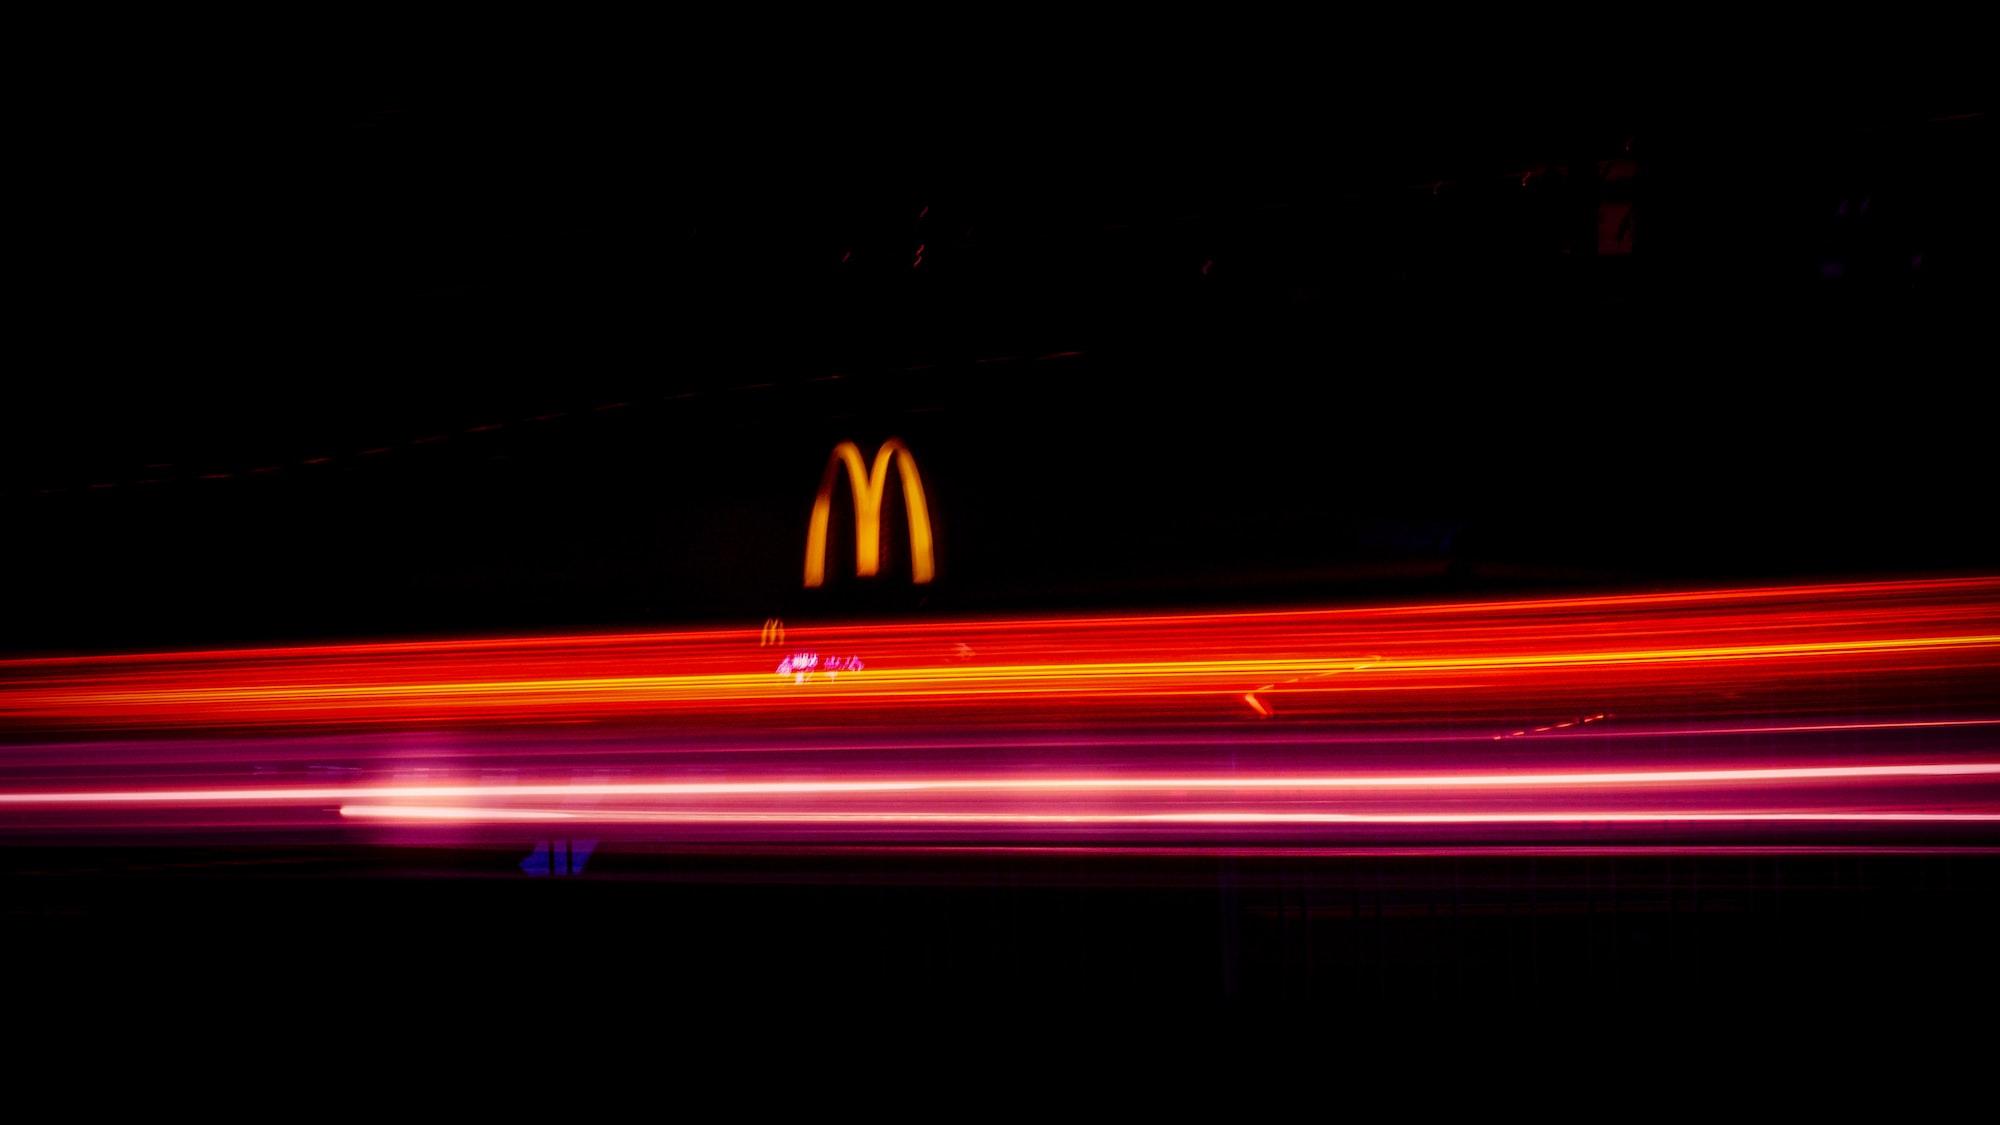 Where's My McDonald's?